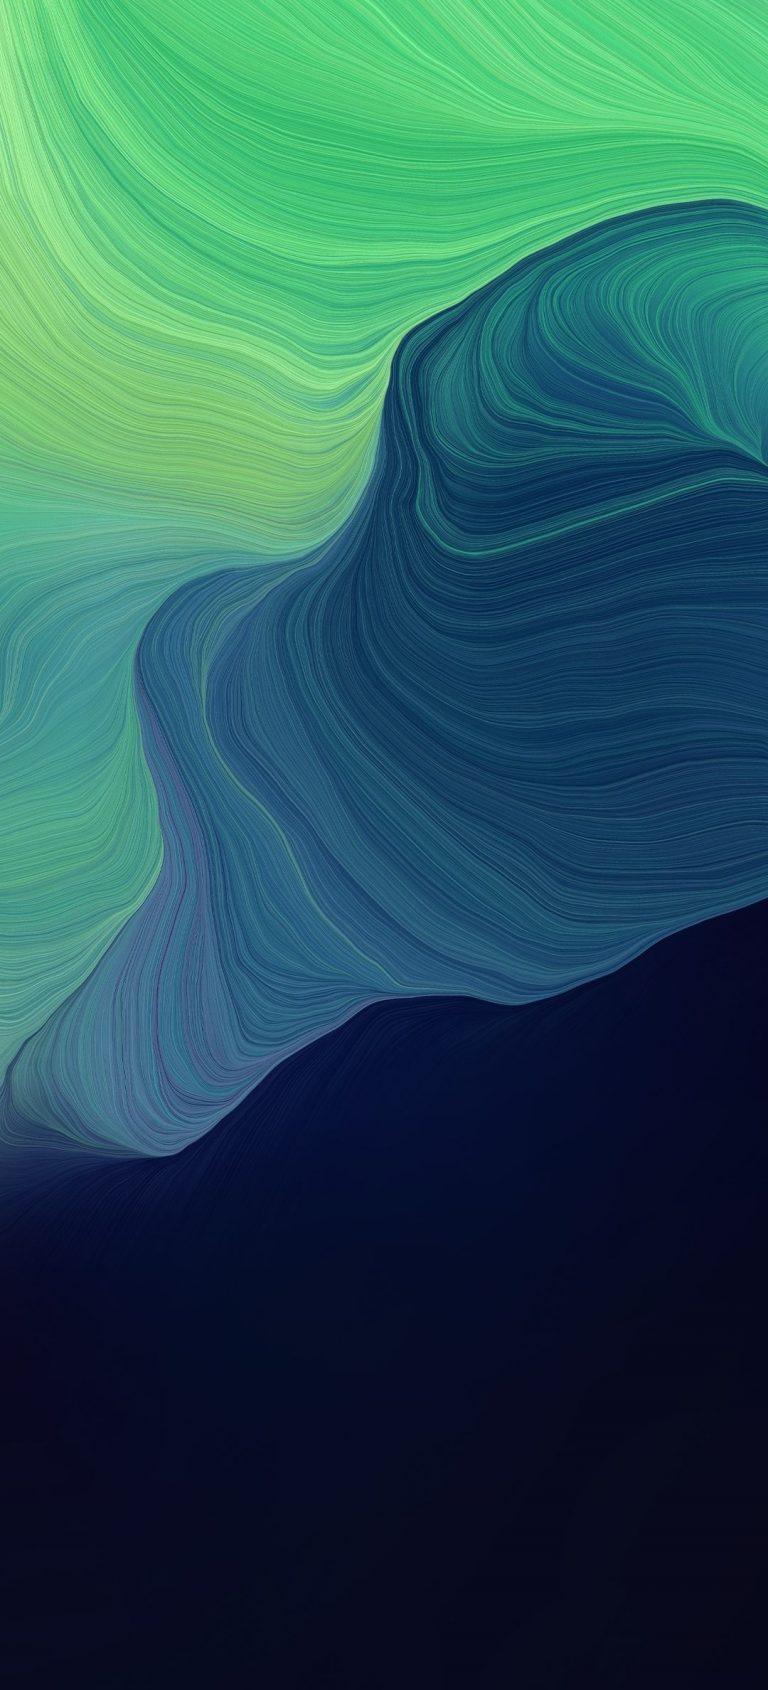 Vivo X50 Pro Stock Wallpaper [1080x2376] - 12